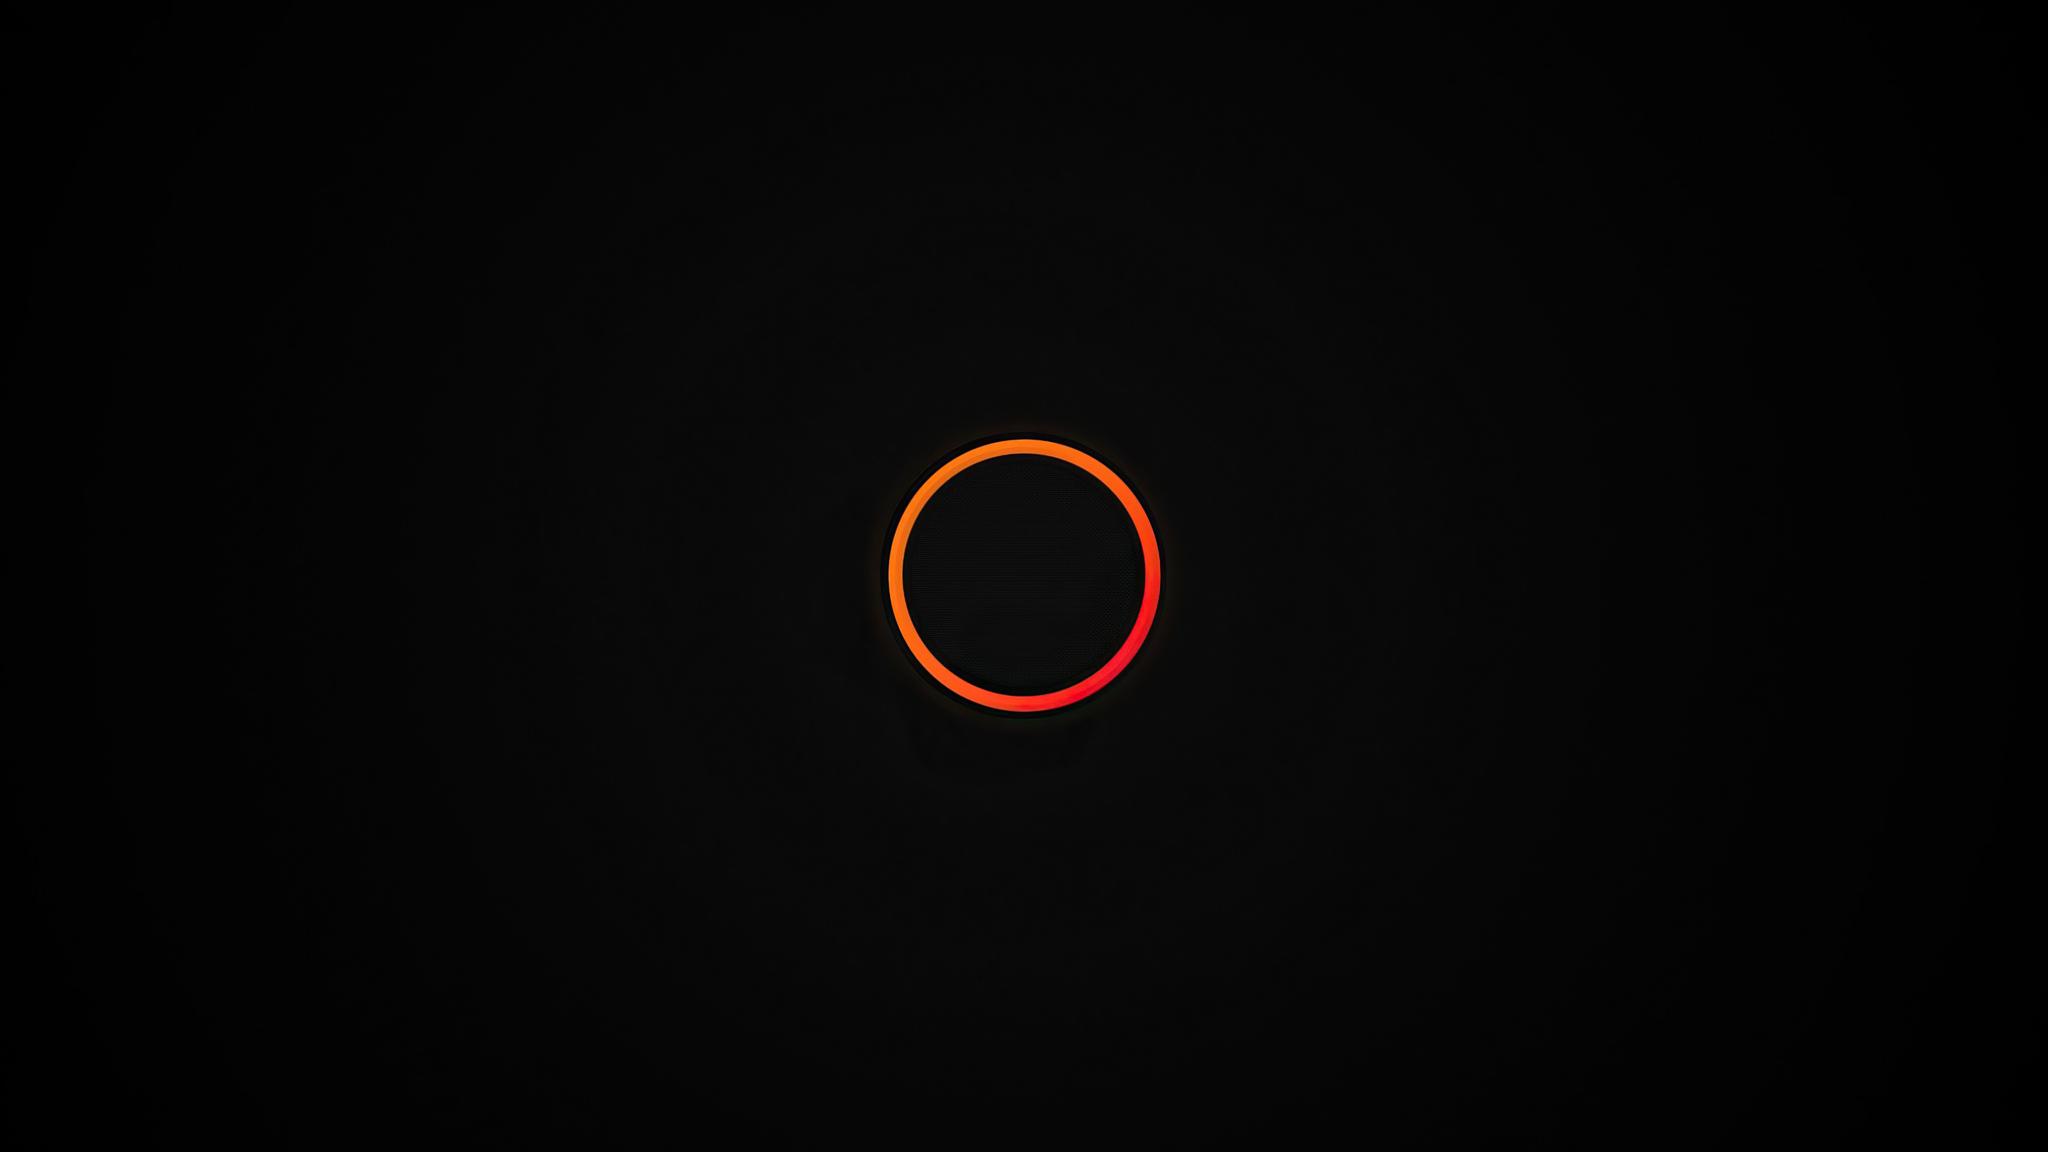 dark-simple-circle-4k-k7.jpg